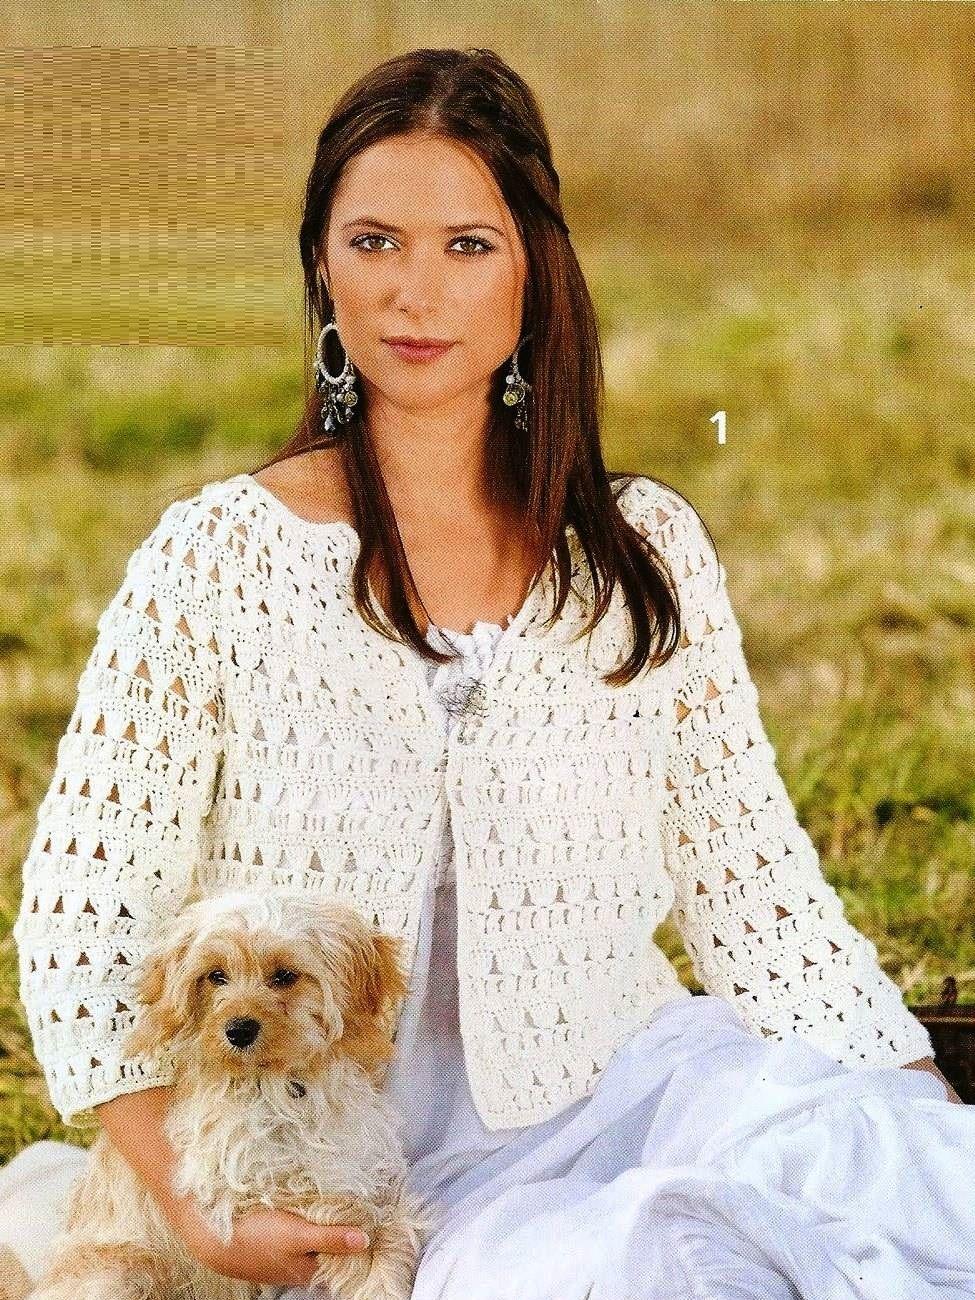 Chaqueta Blanca Patron - Patrones Crochet | Abrigos, chaquetas ...